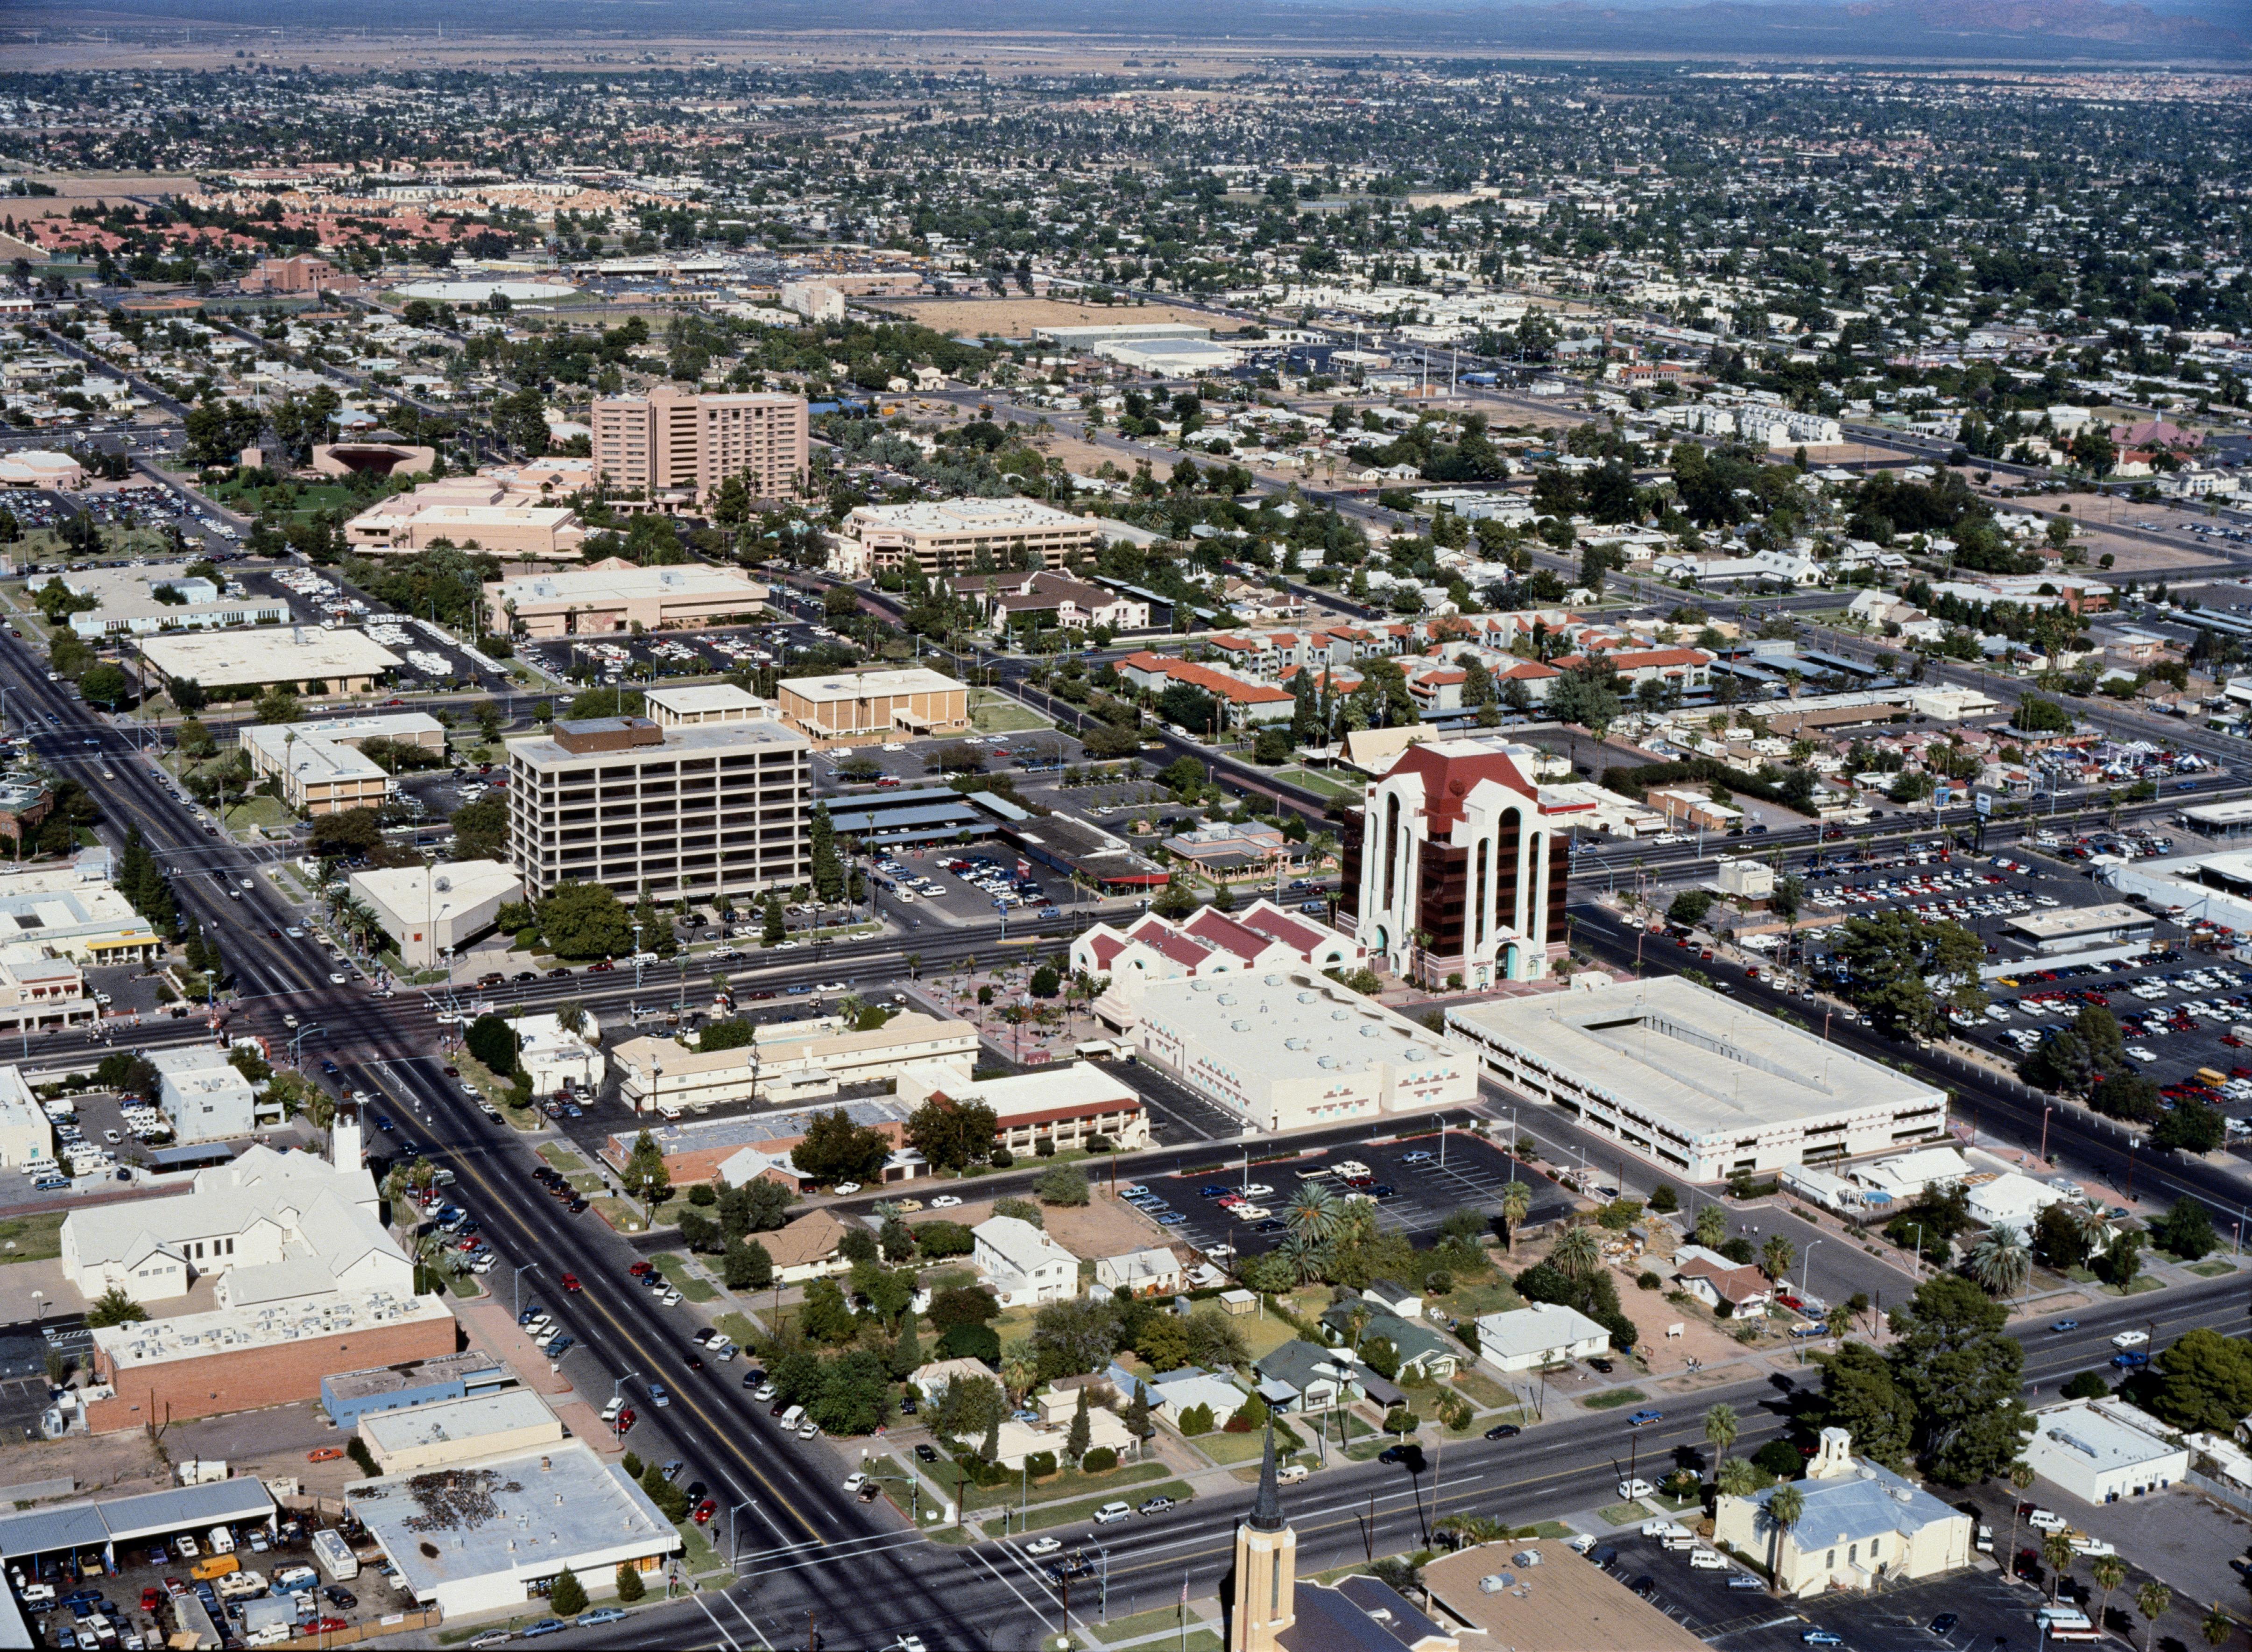 USA, Arizona, Mesa, cityscape, aerial view